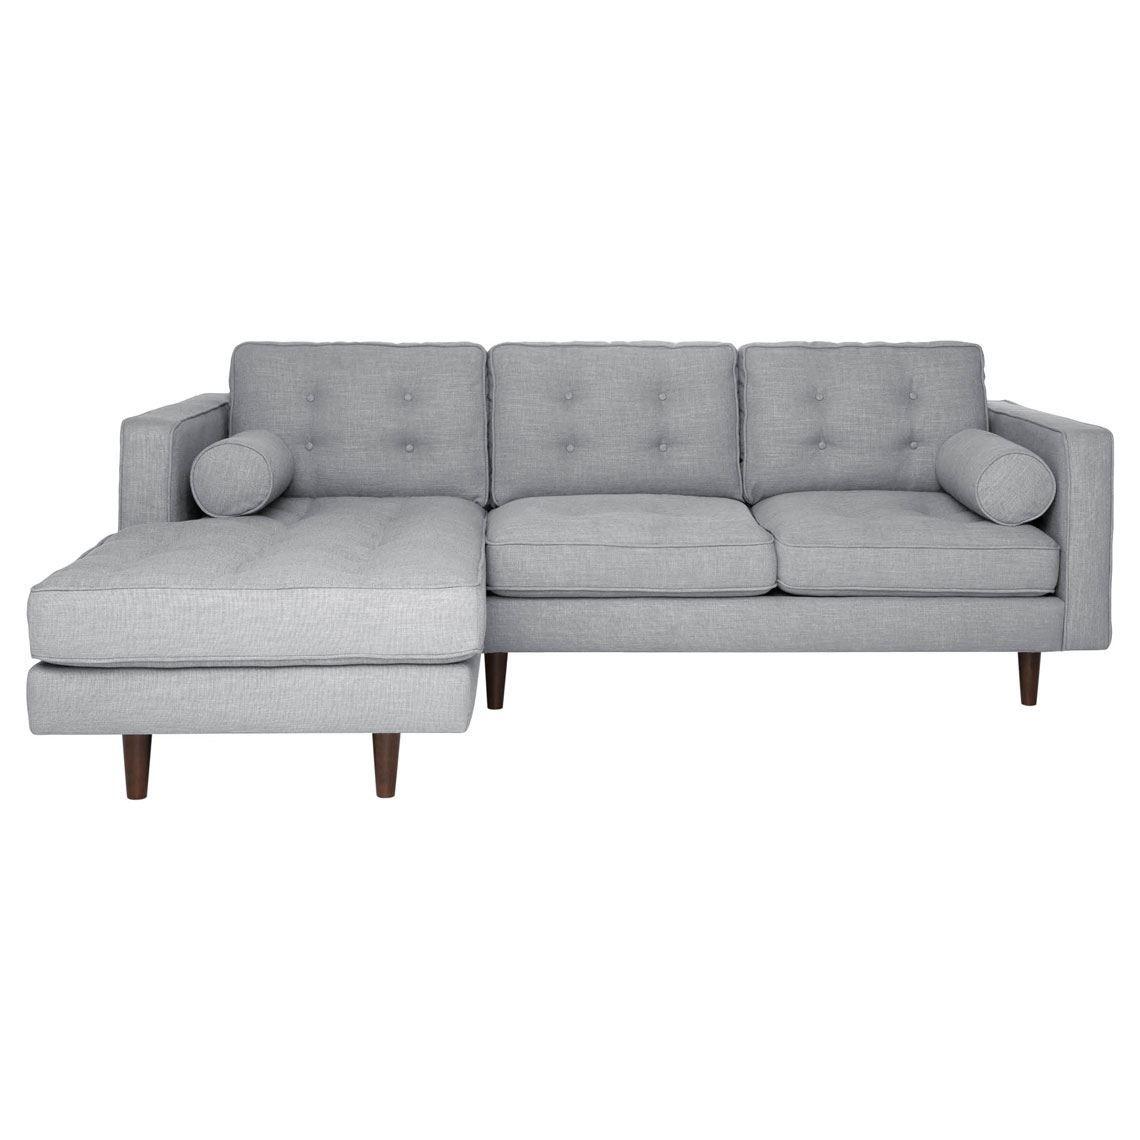 Copenhagen 2 Seat Fabric W Left Chaise Size W 229cm X D 177cm X H 83cm In Light Grey Fabric Foam Fibre Freedom Modular Sofa Sofa Contemporary Furniture